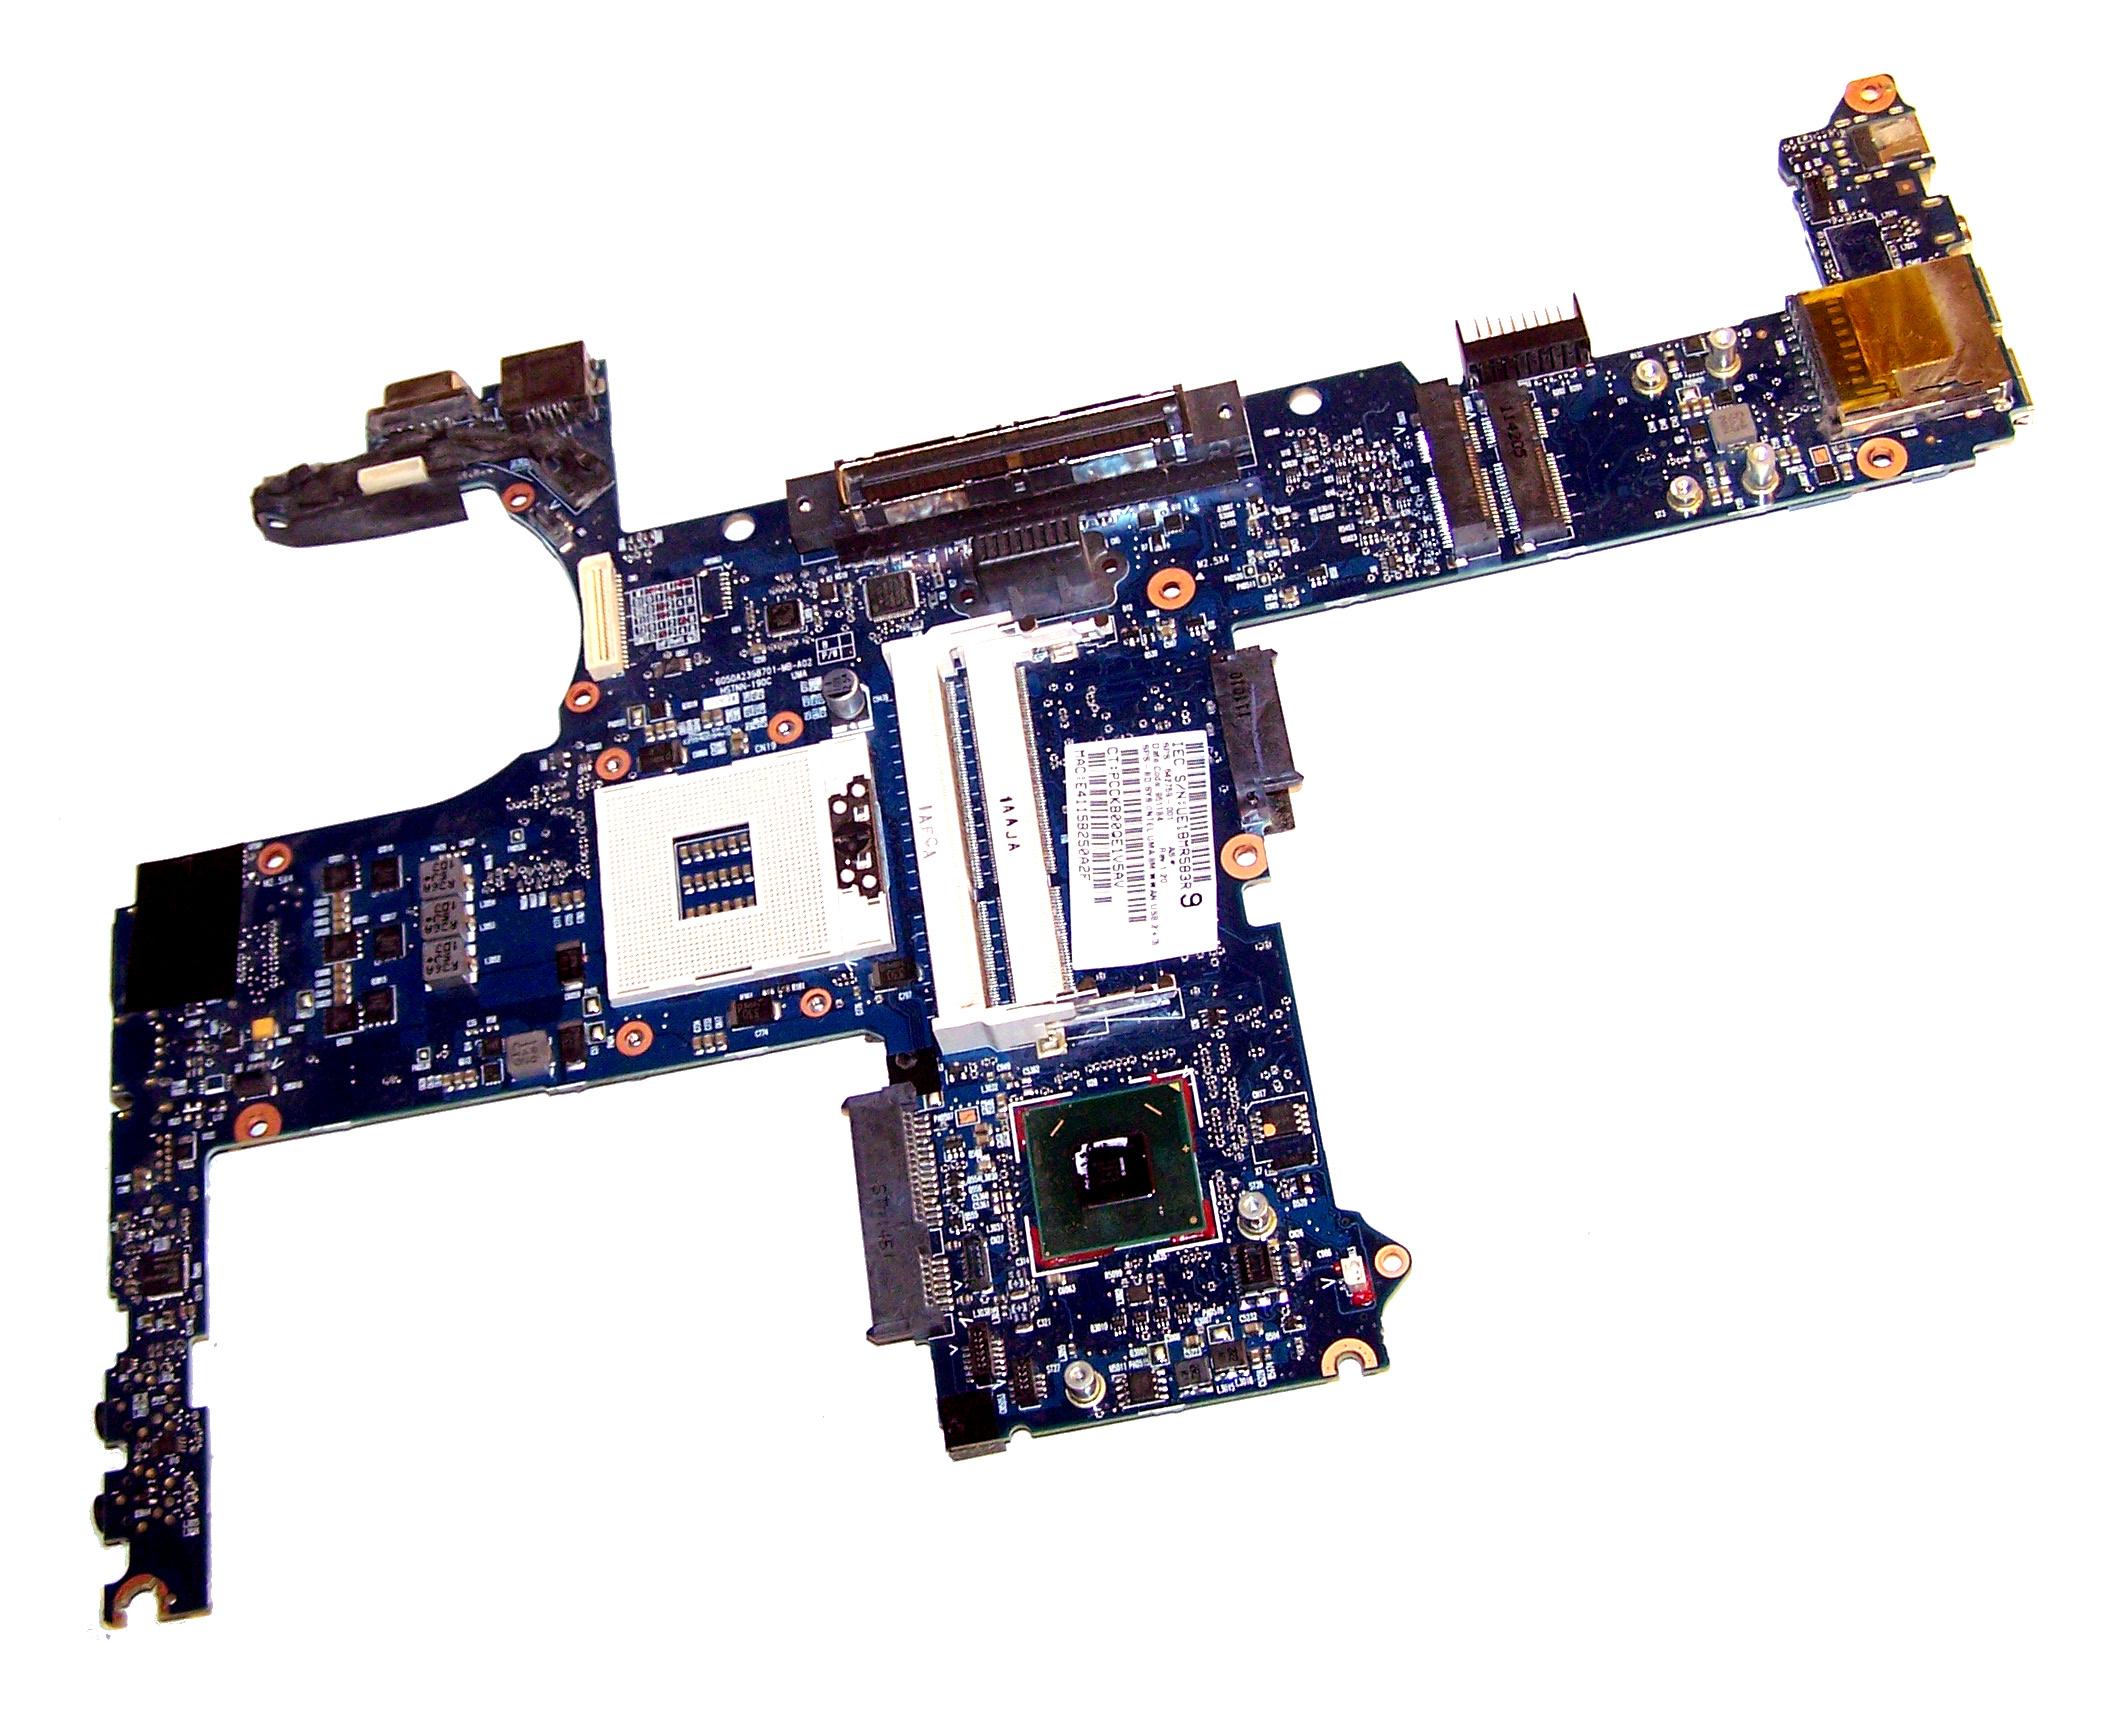 HP 642759-001 EliteBook 8460p Socket G2 Motherboard (UMA